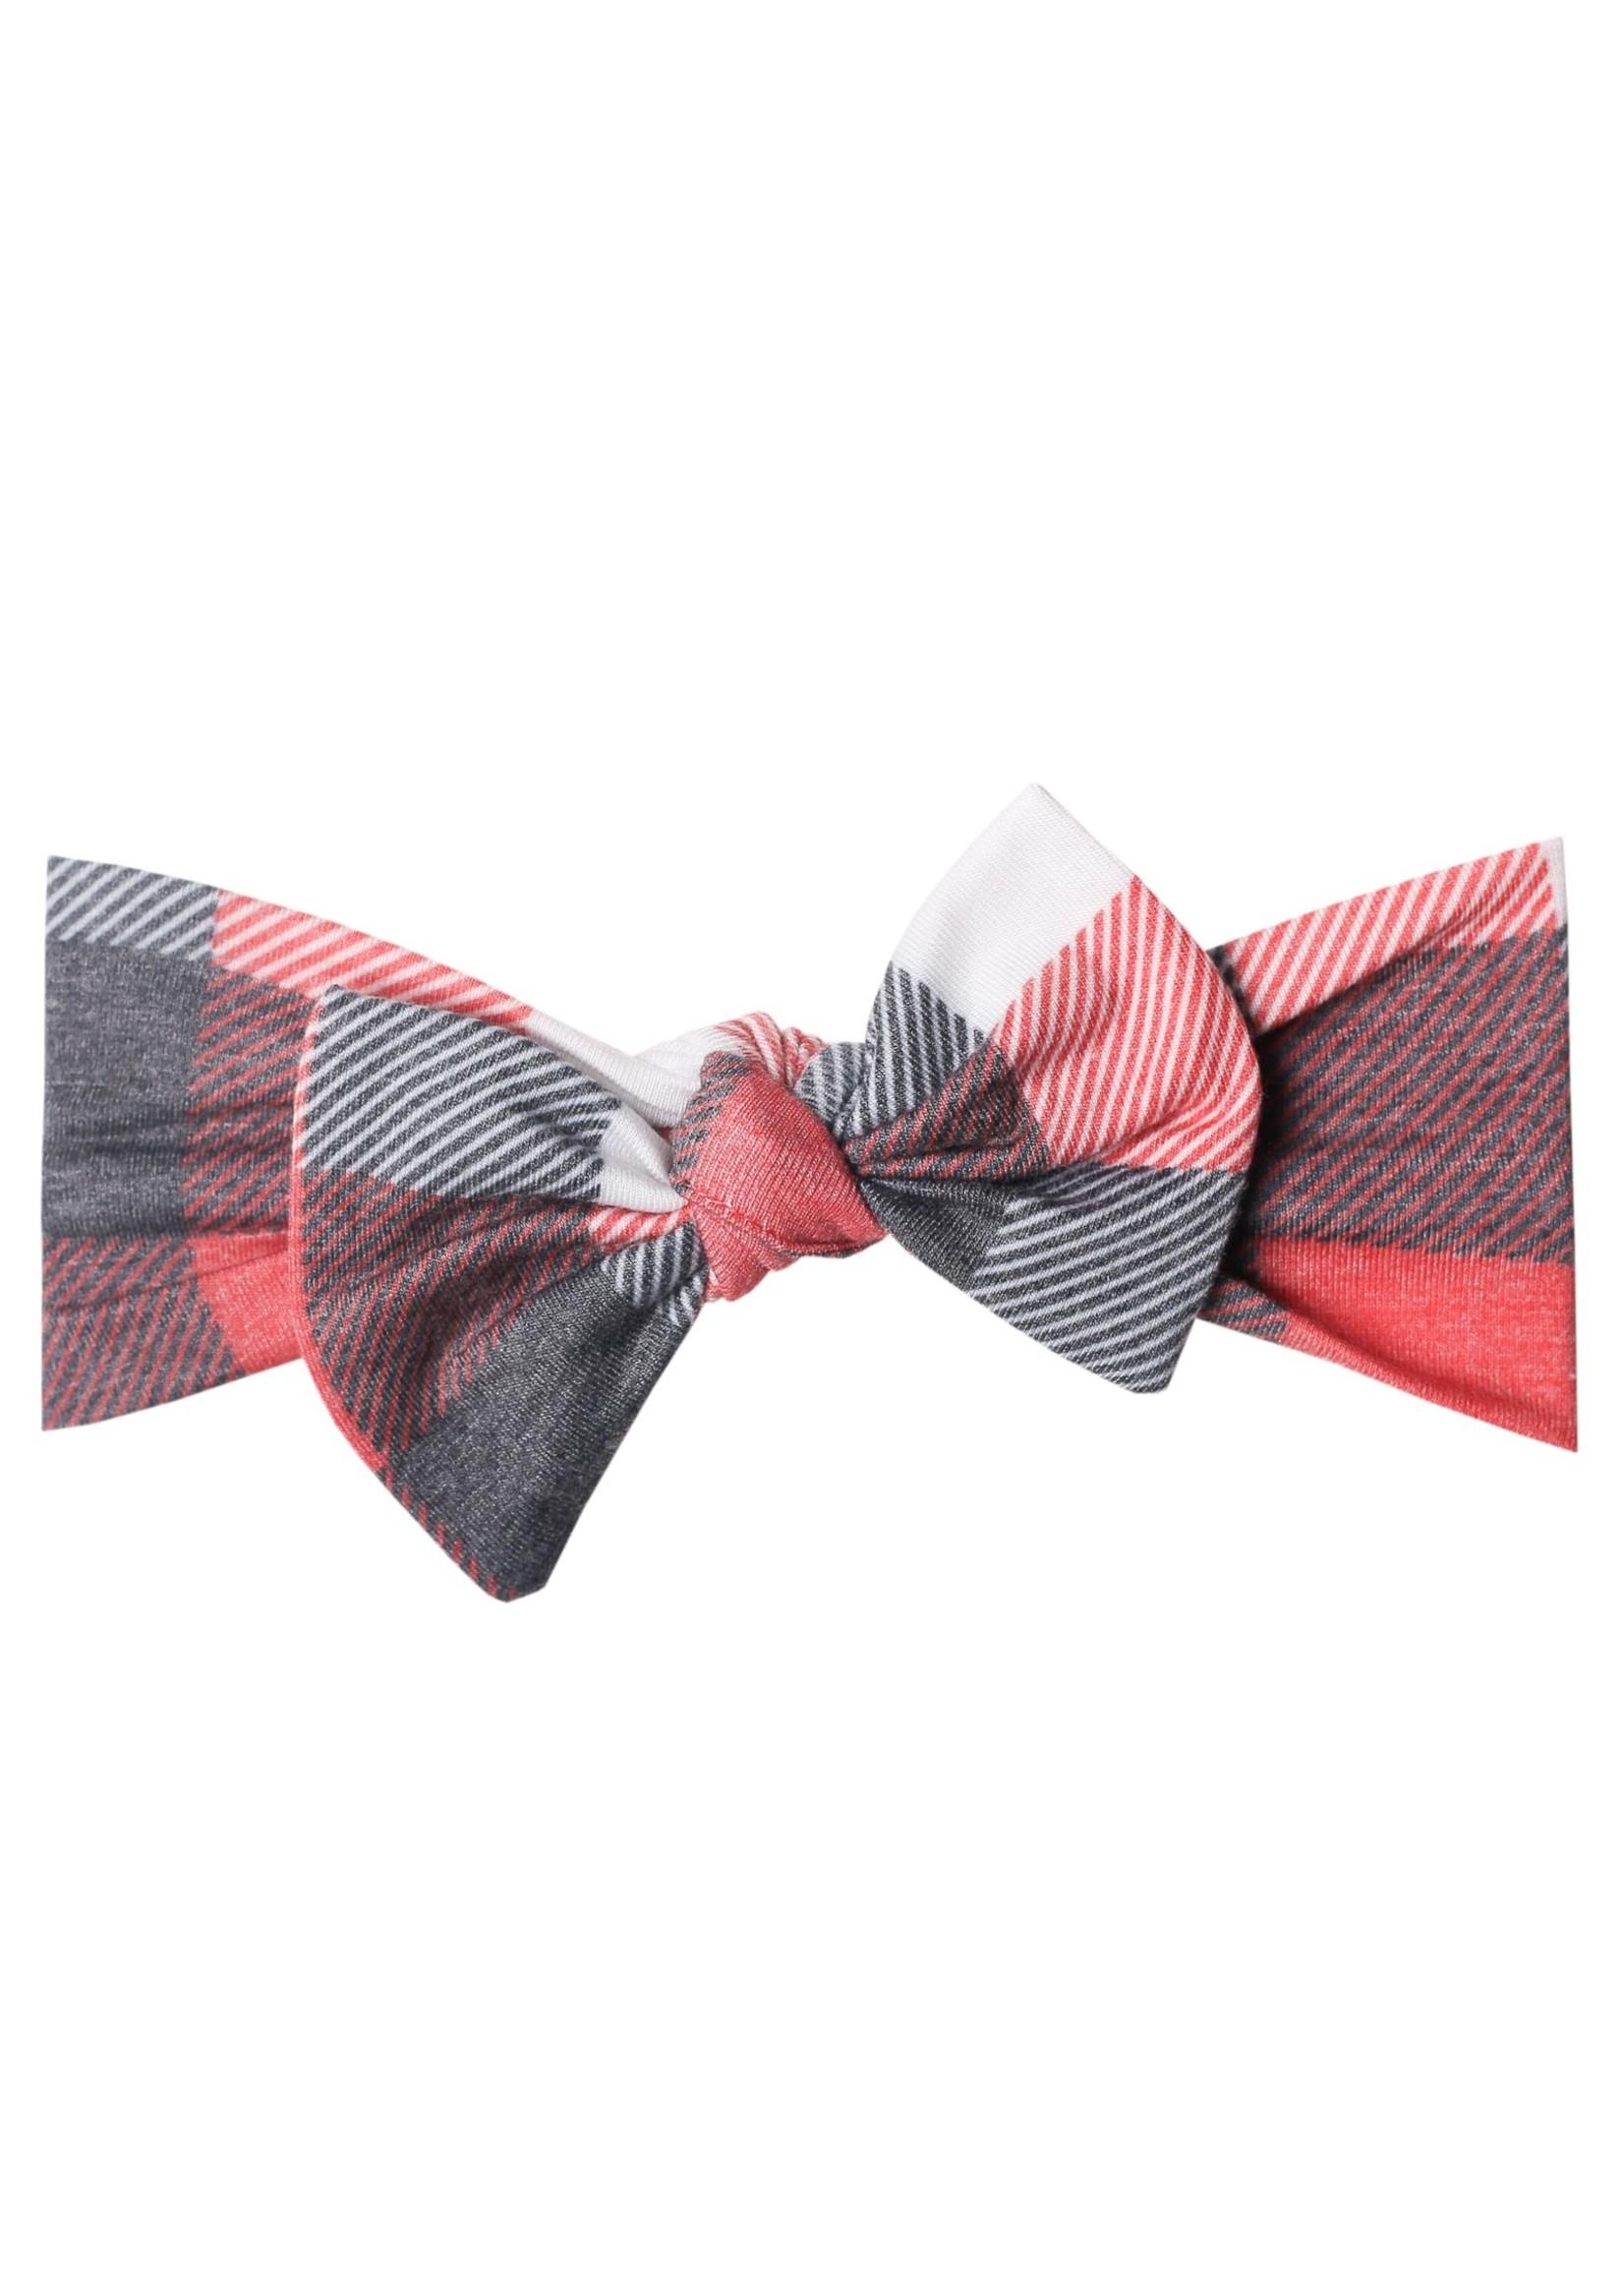 Copper pearl Knit Headband Bow - Jack